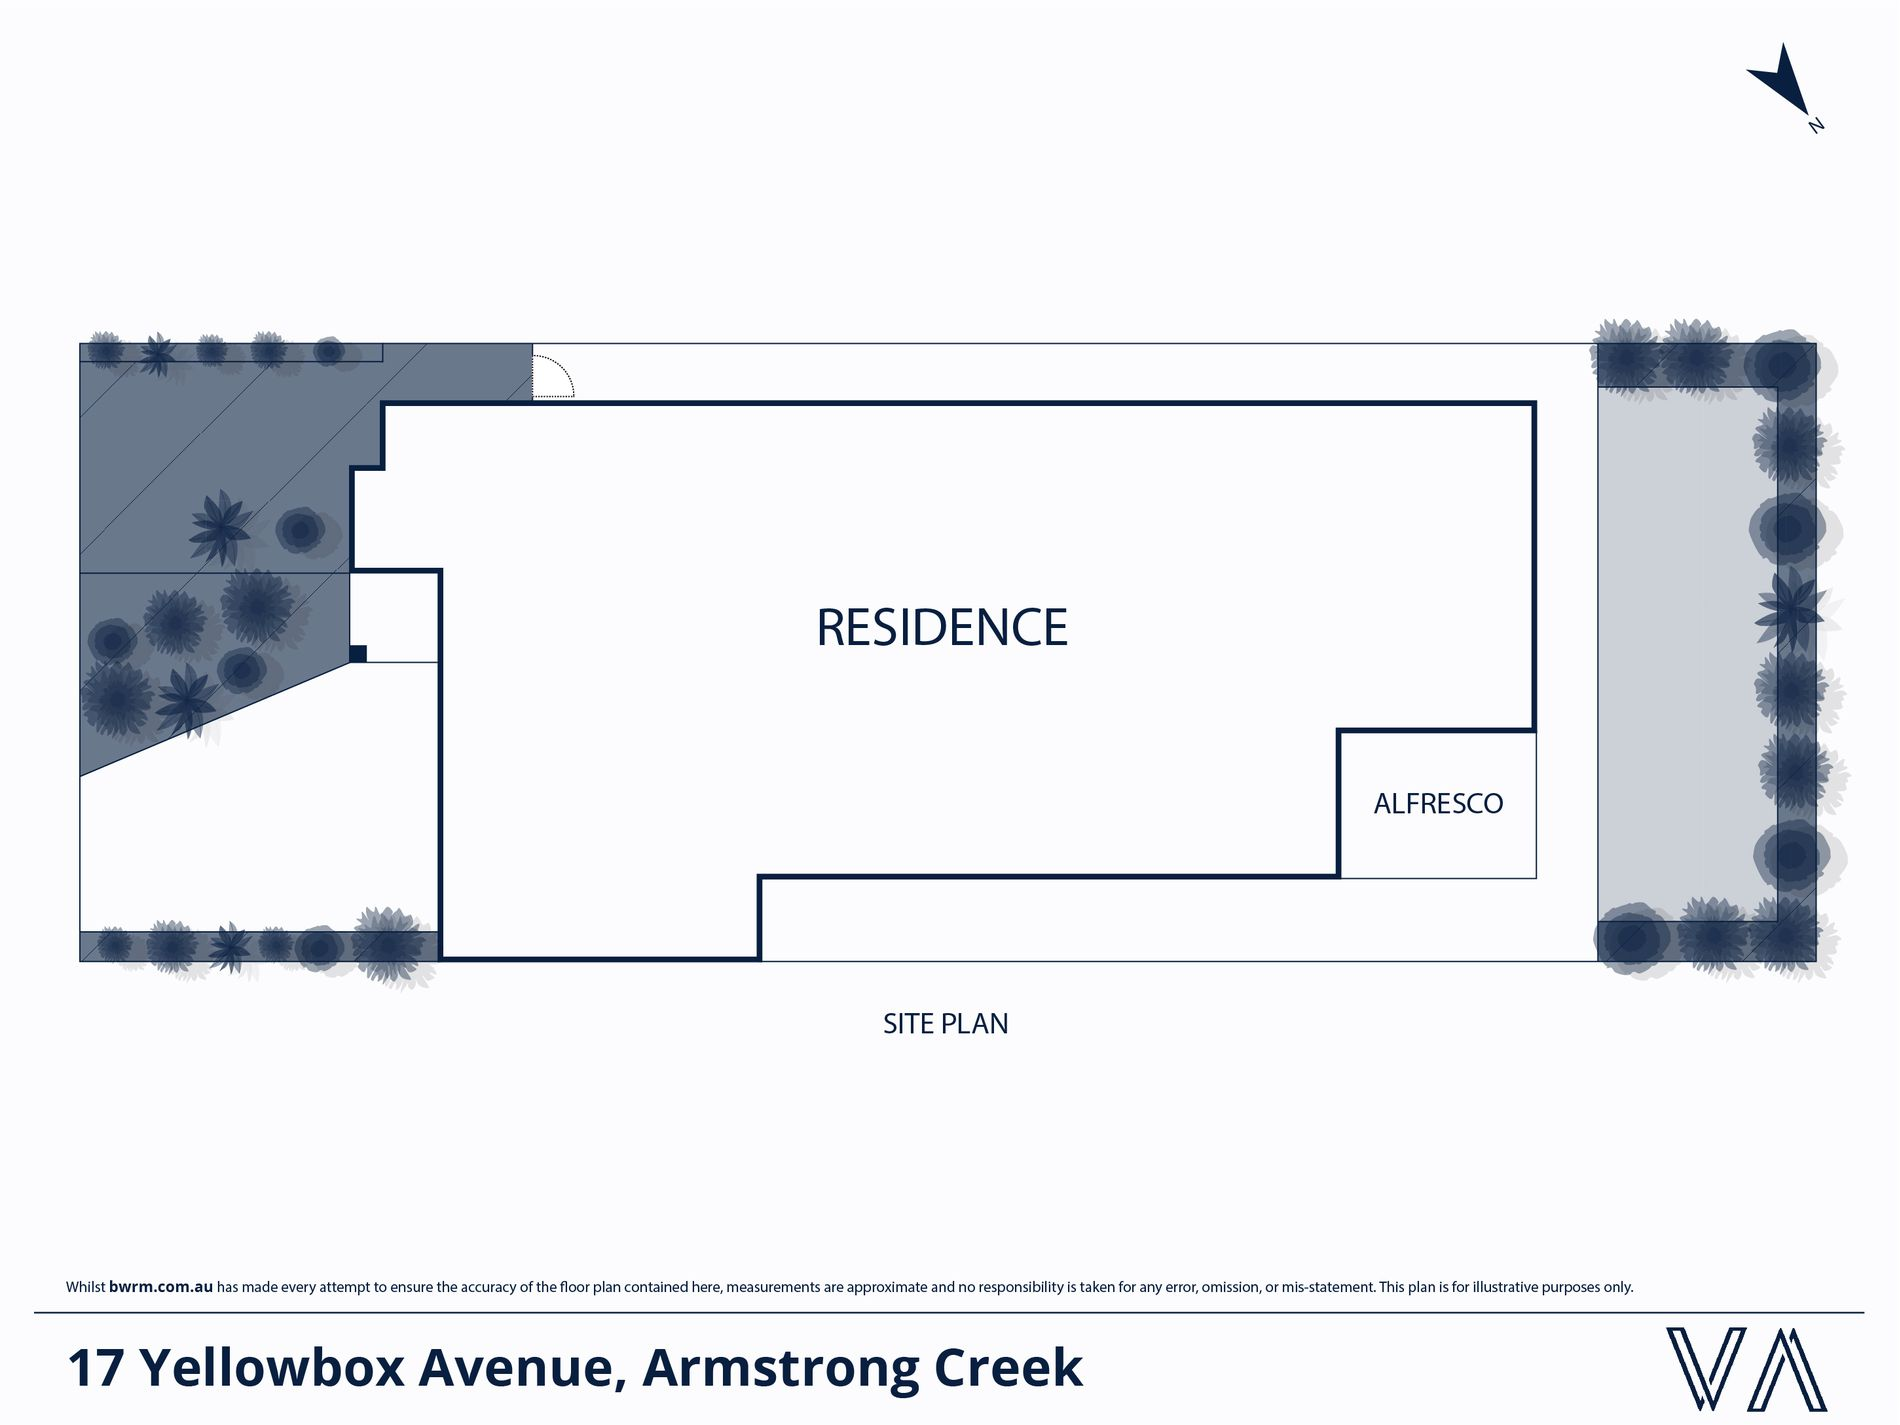 17 Yellowbox Ave, Armstrong Creek